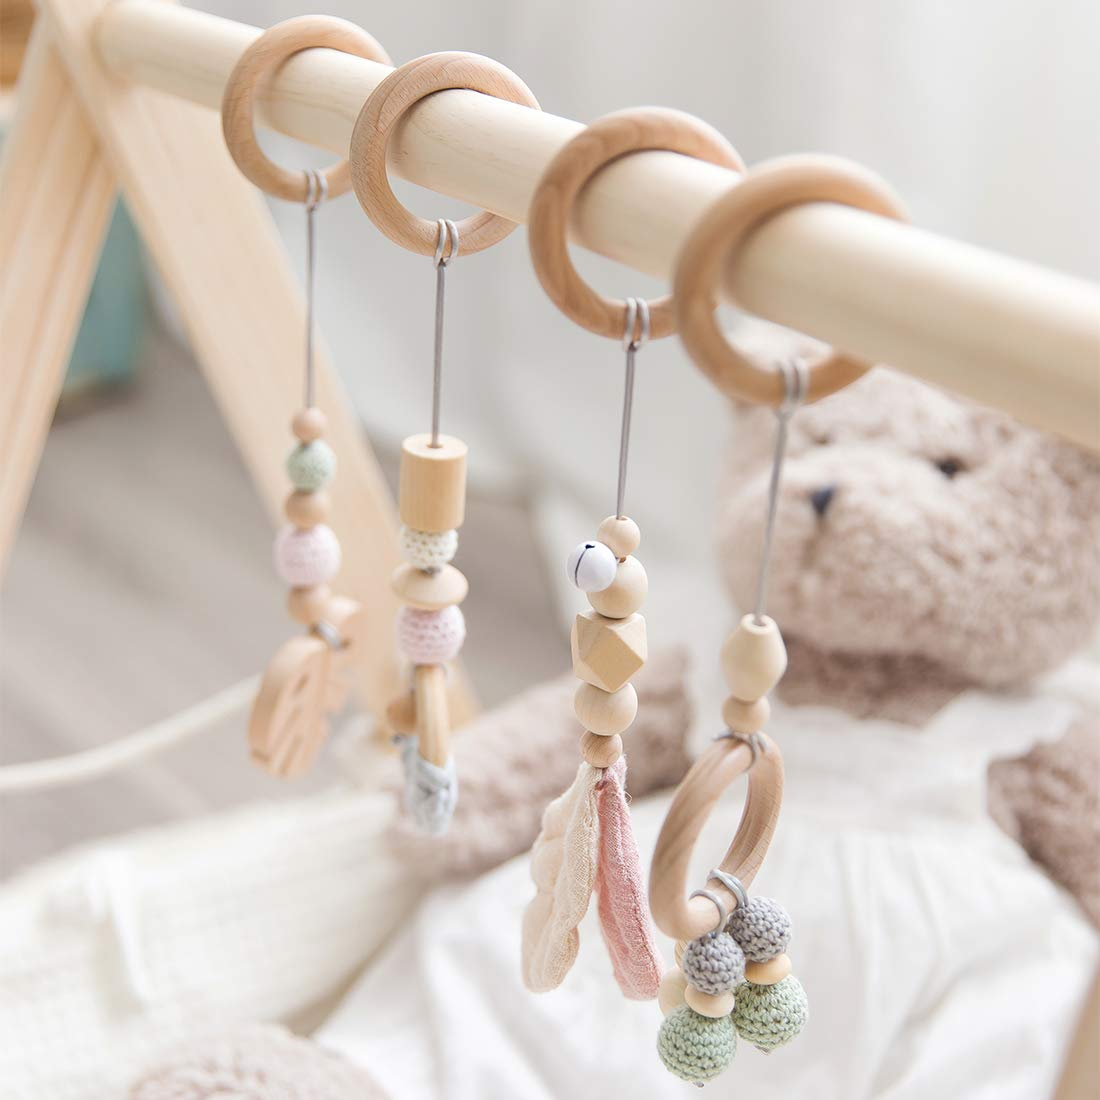 Amazon.com: Juguetes de gimnasio Lets Make Baby Play: Toys ...